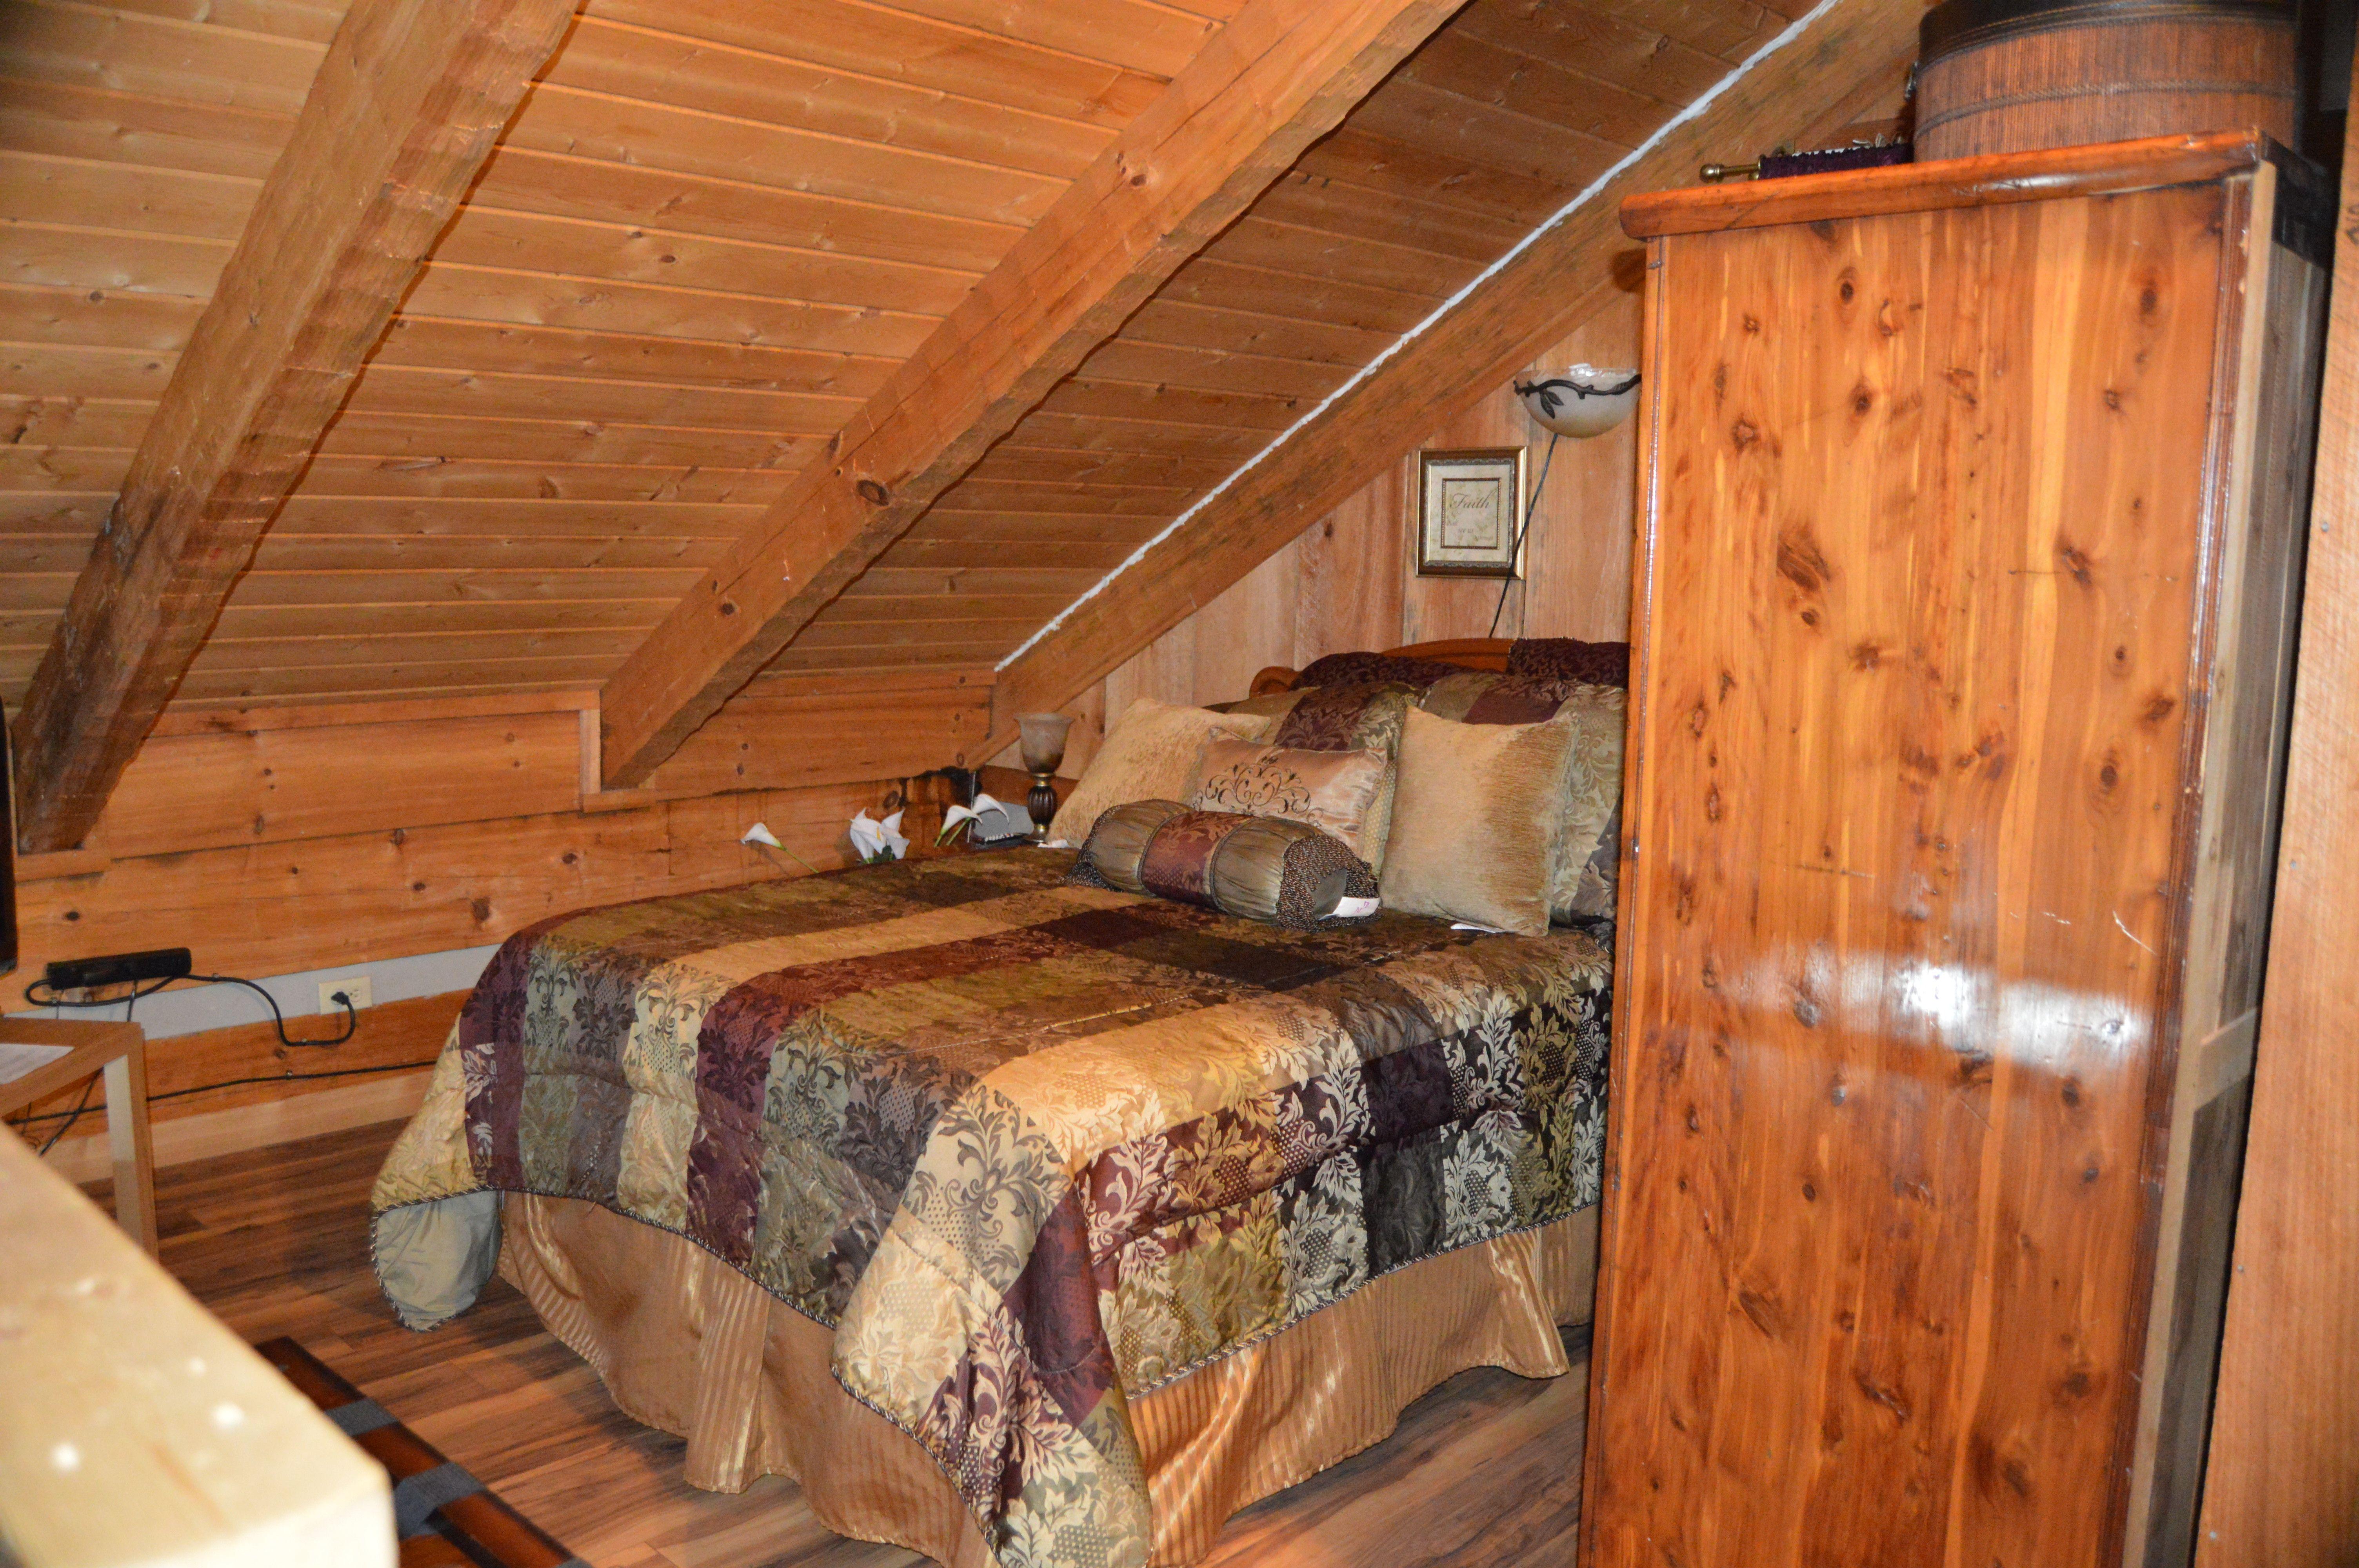 Full size bed in loft